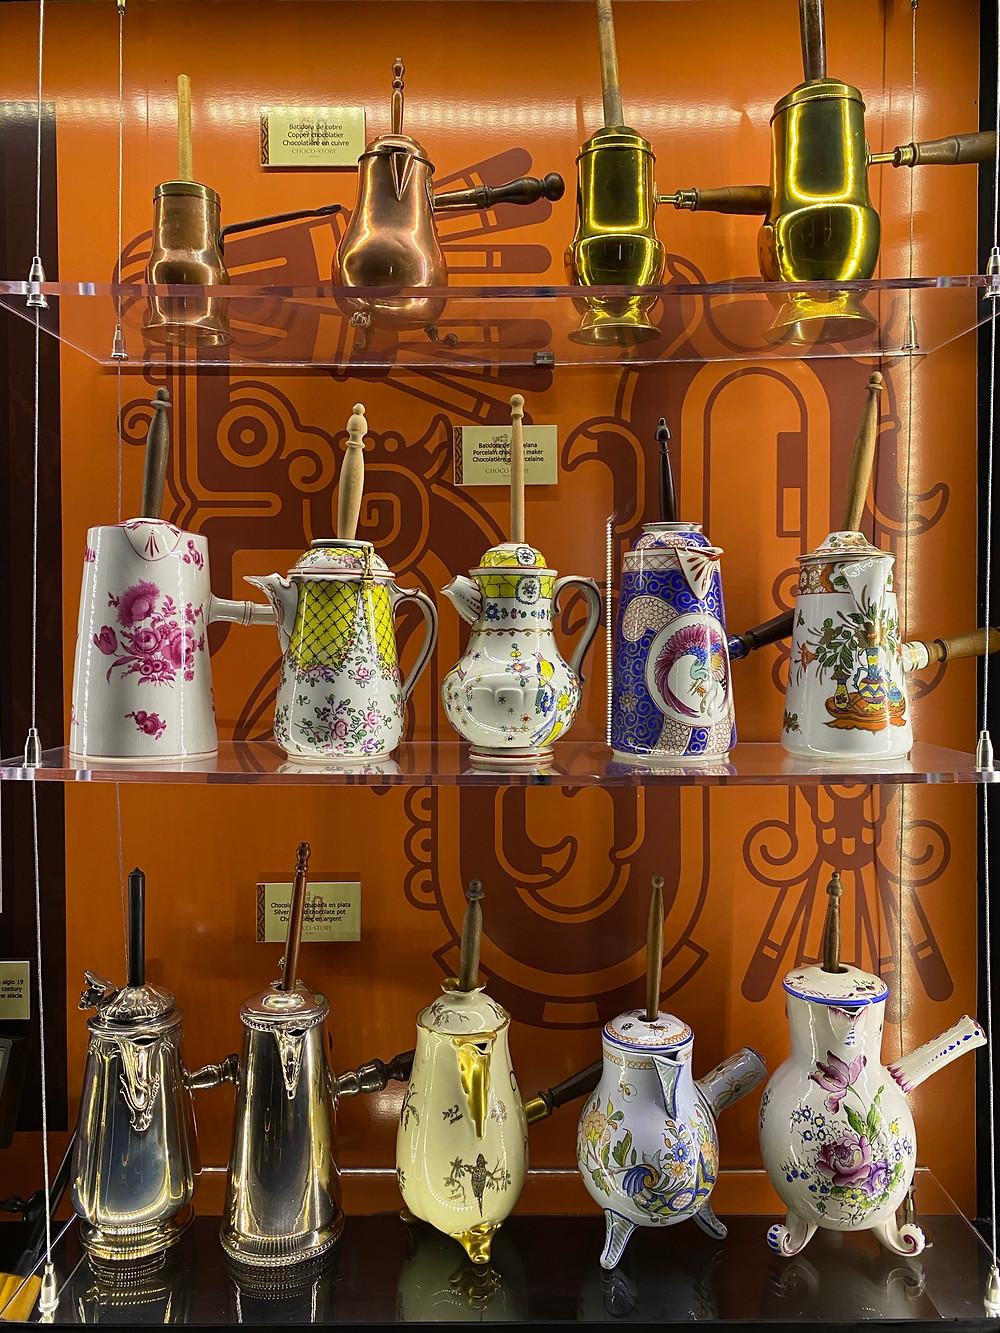 Chocolate history. Mexico. Valladolid Chocolate museum